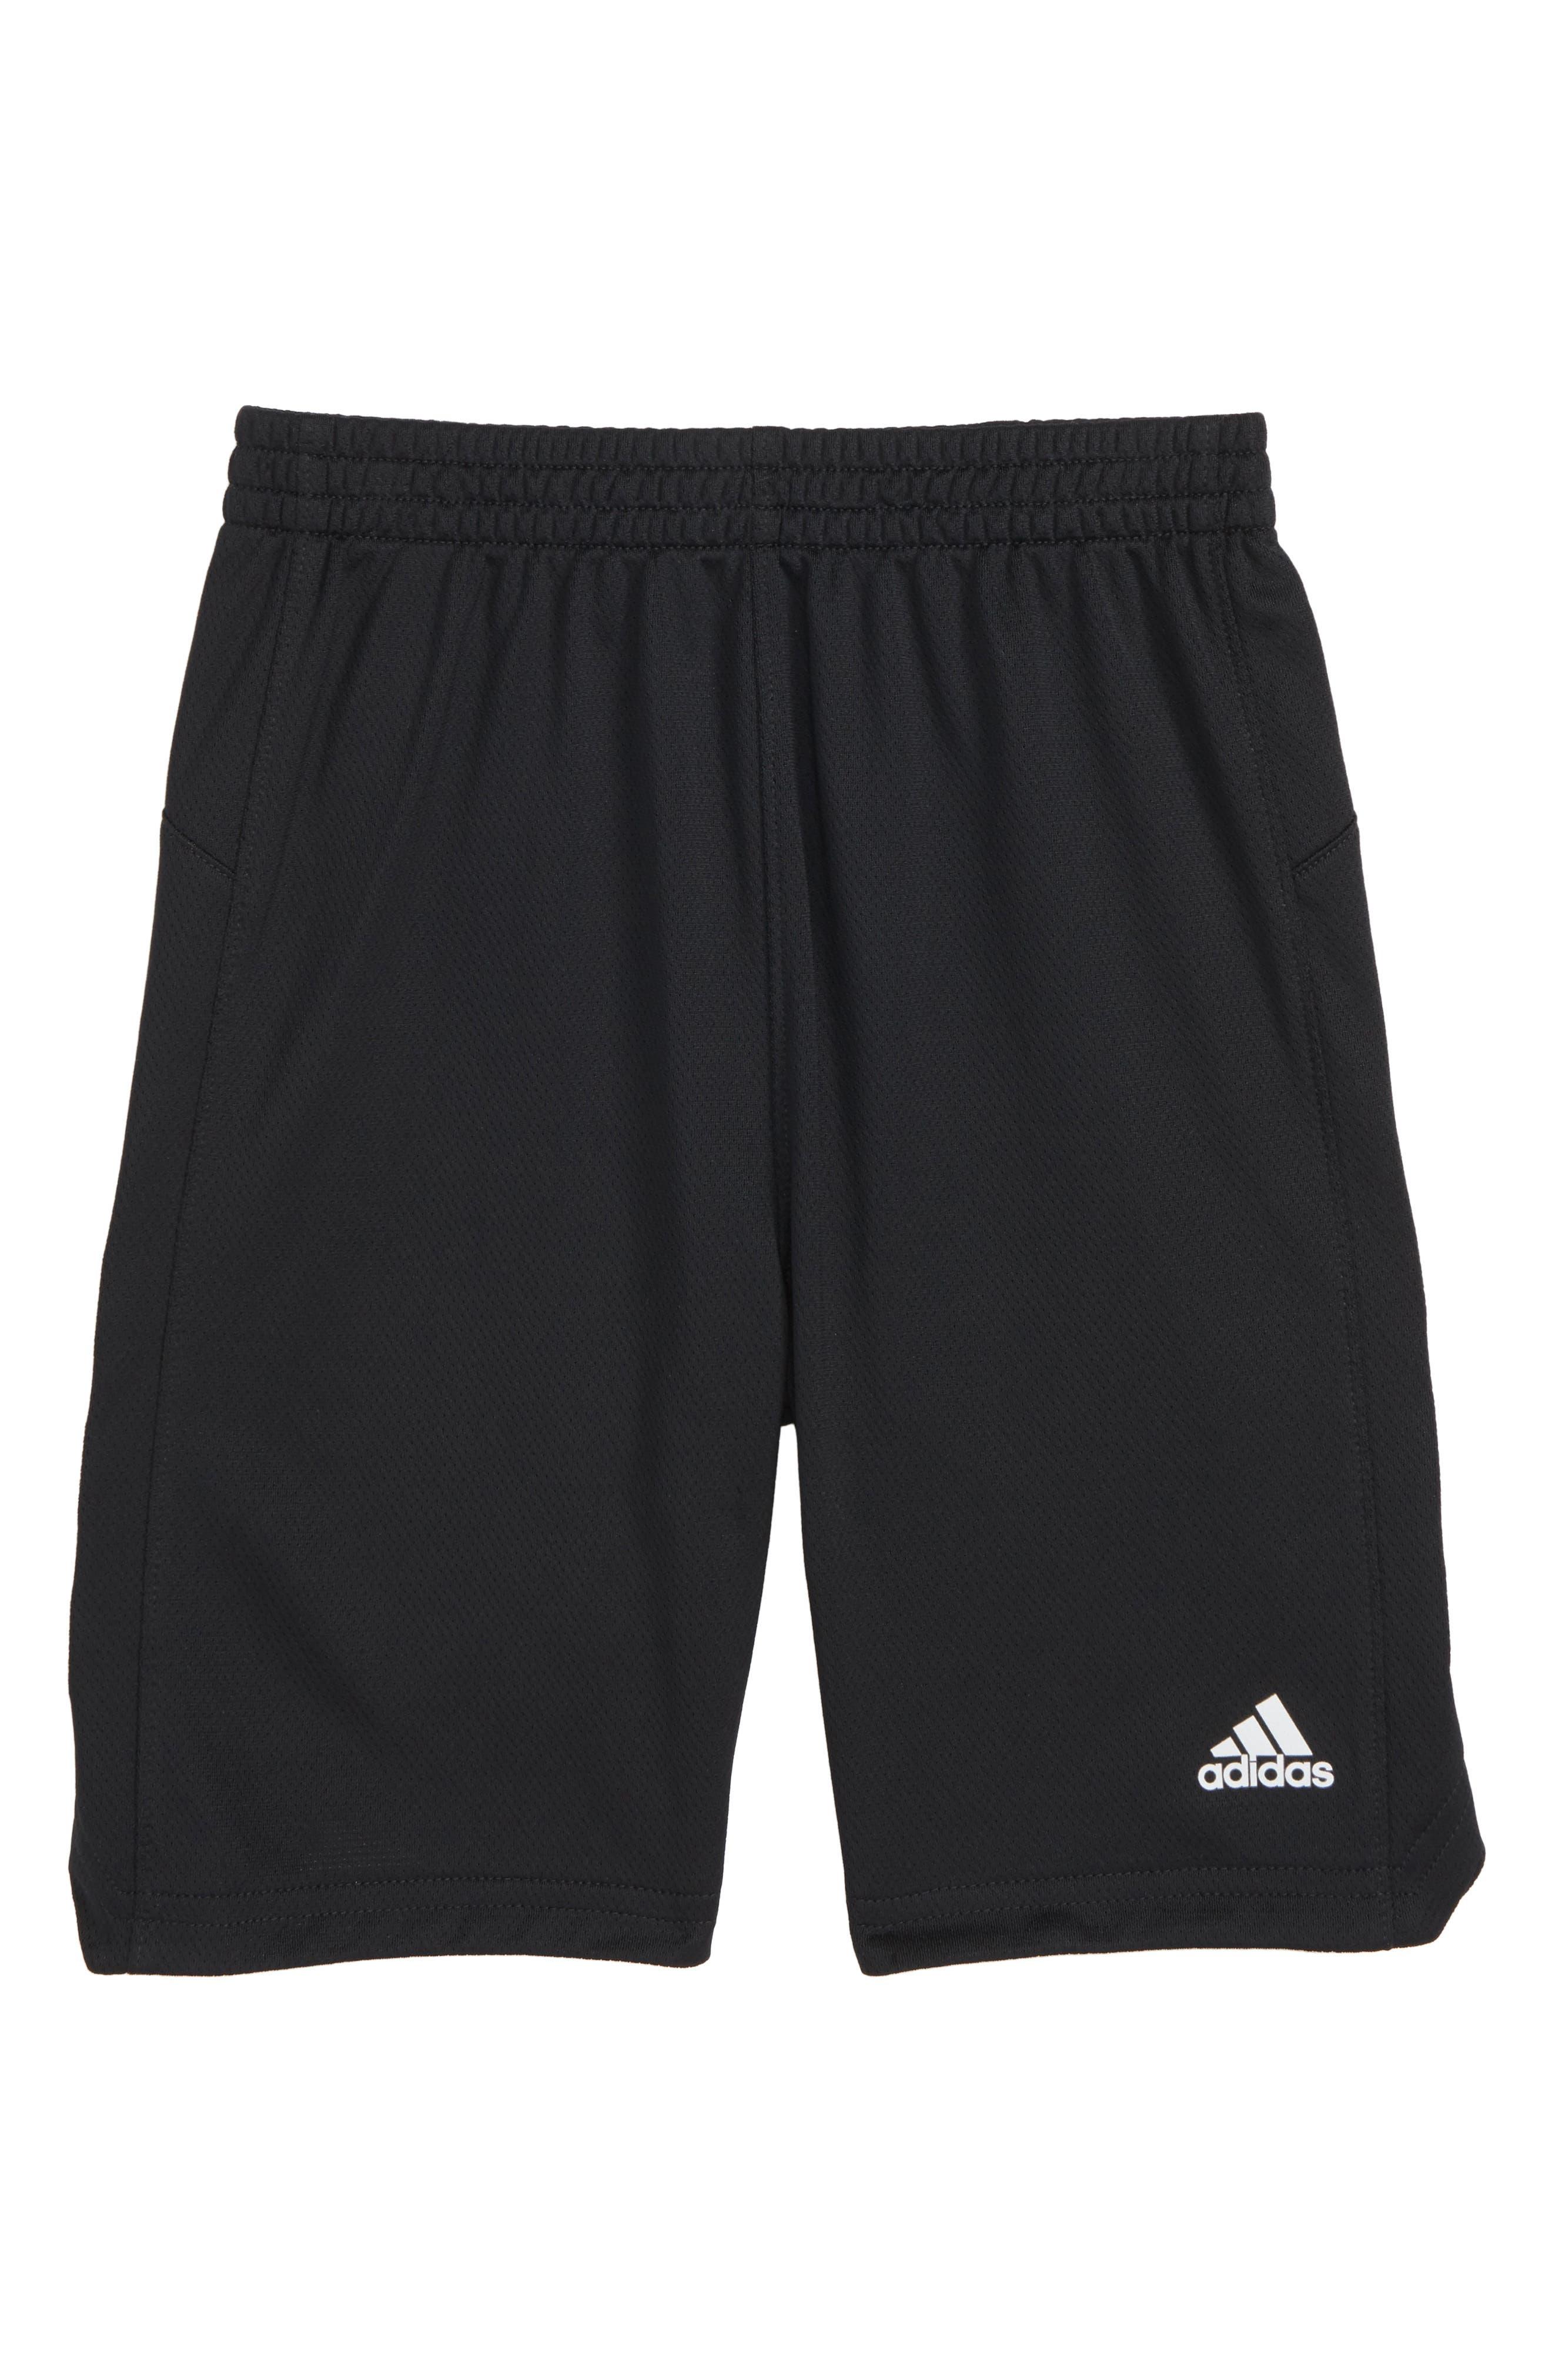 Sport Shorts,                         Main,                         color, Black